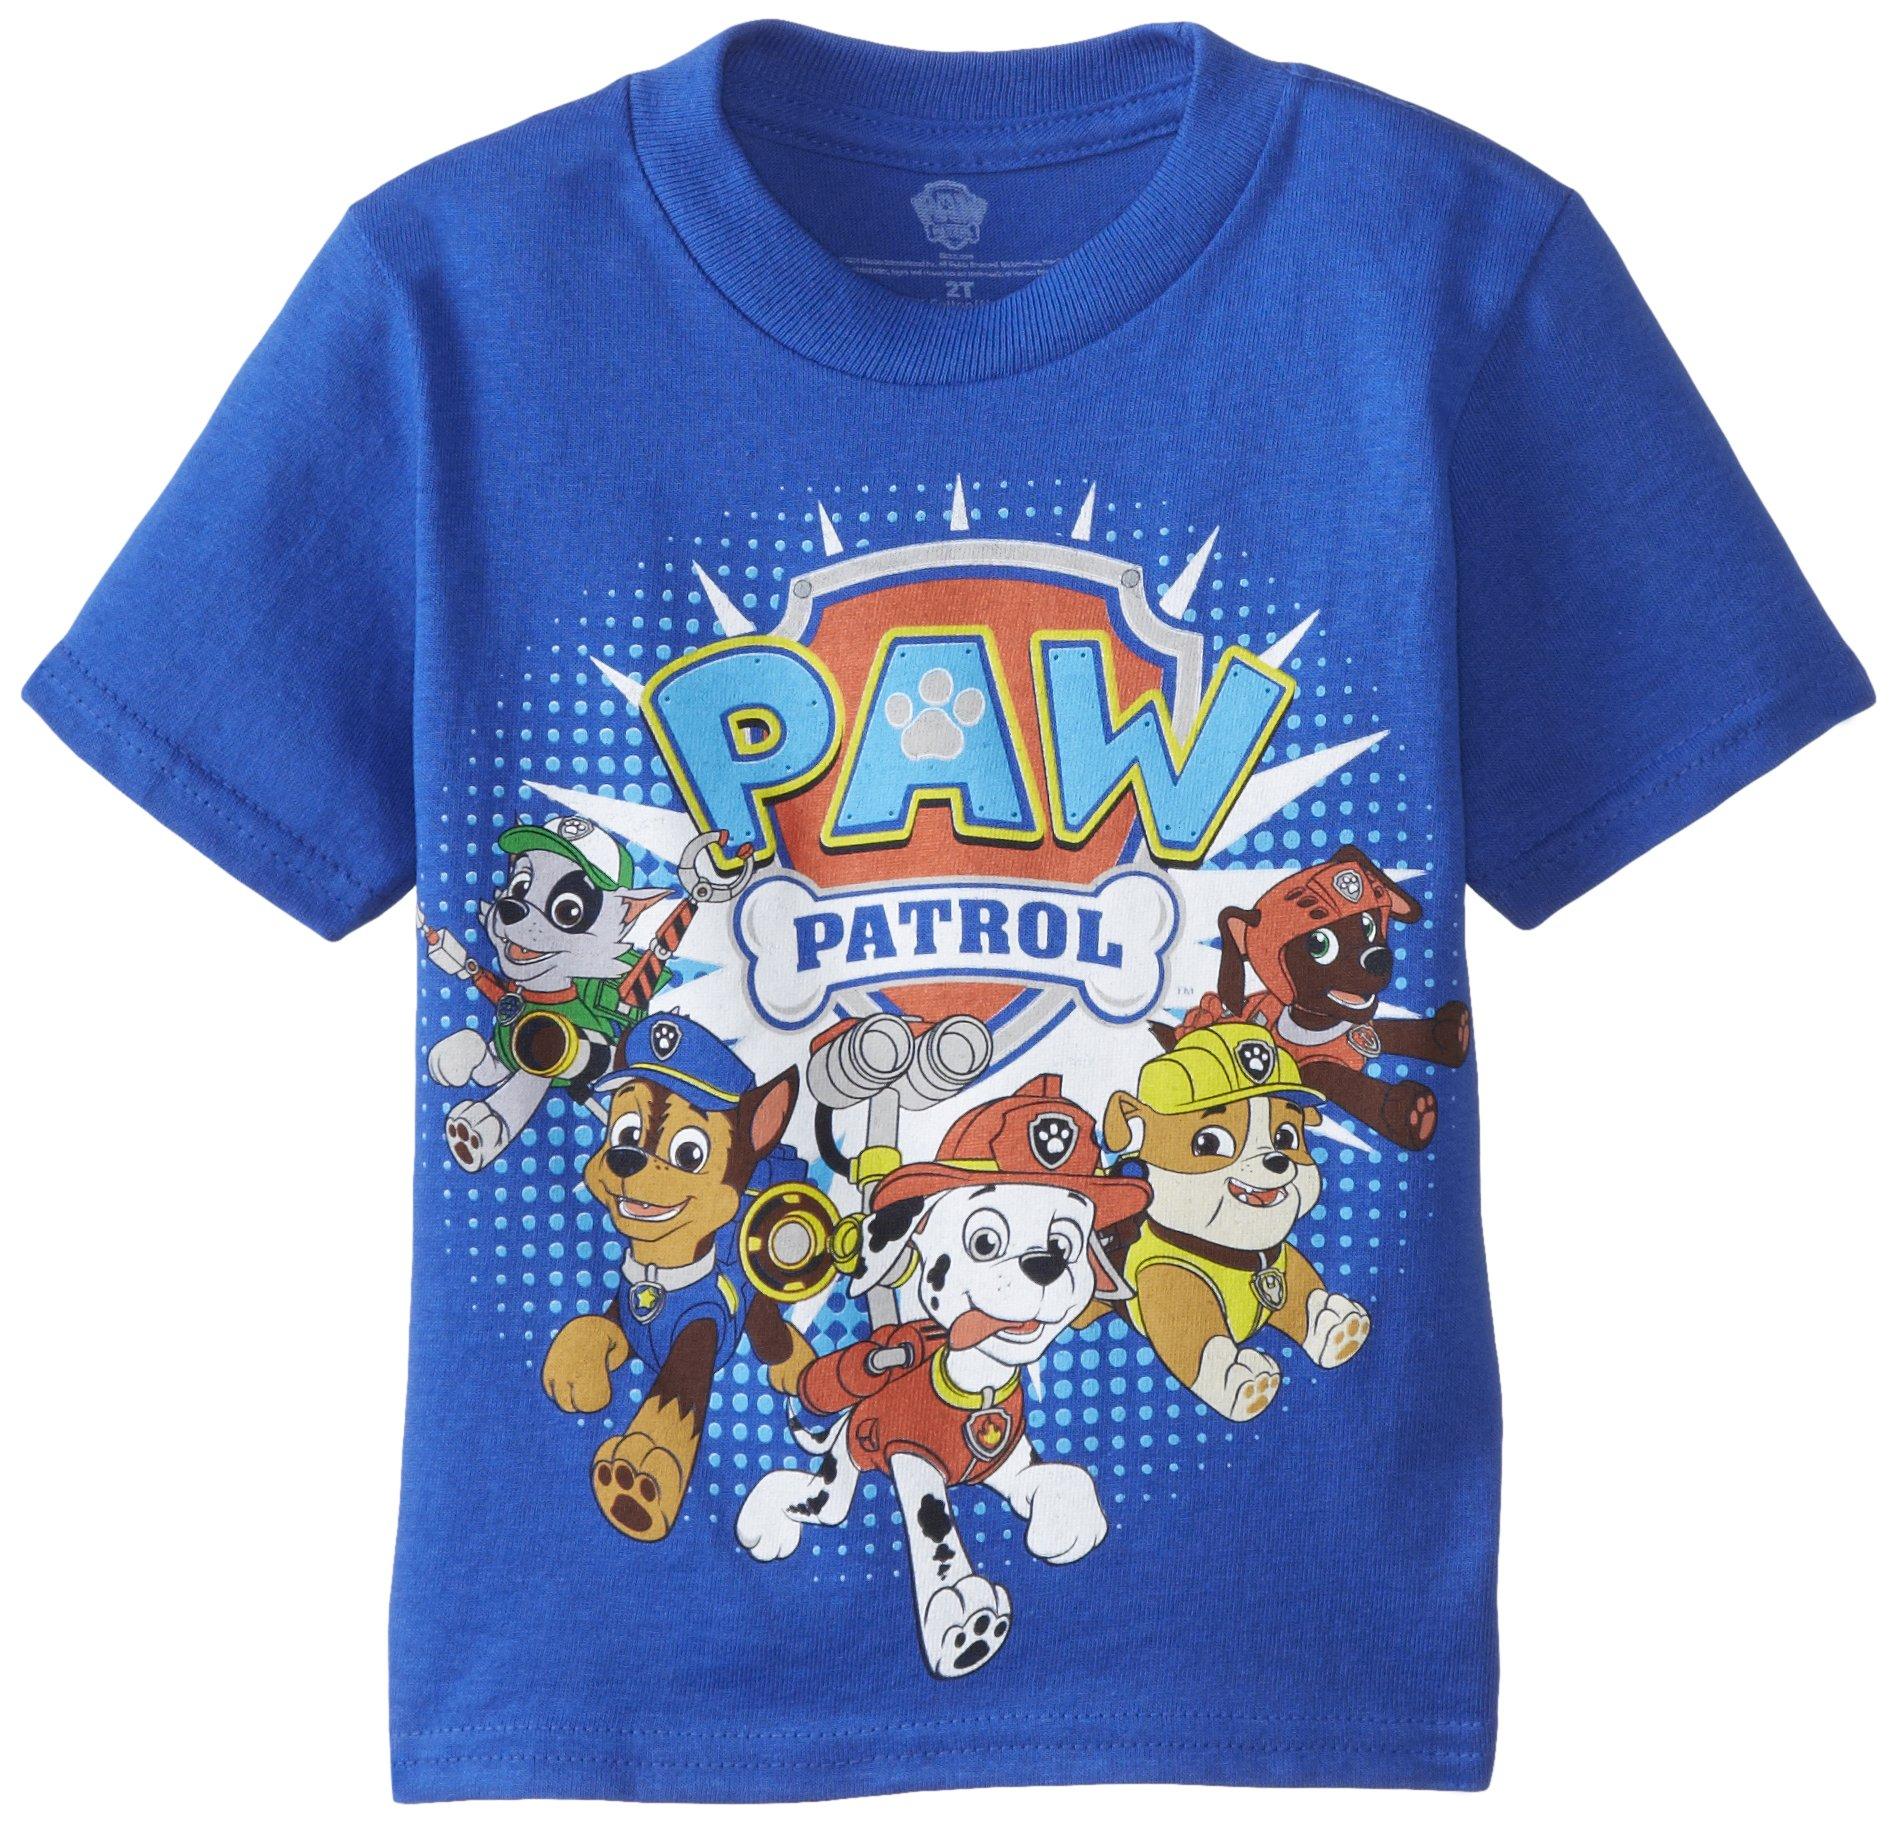 Paw Patrol Little Boys' Toddler Group T-Shirt, Royal, 3T